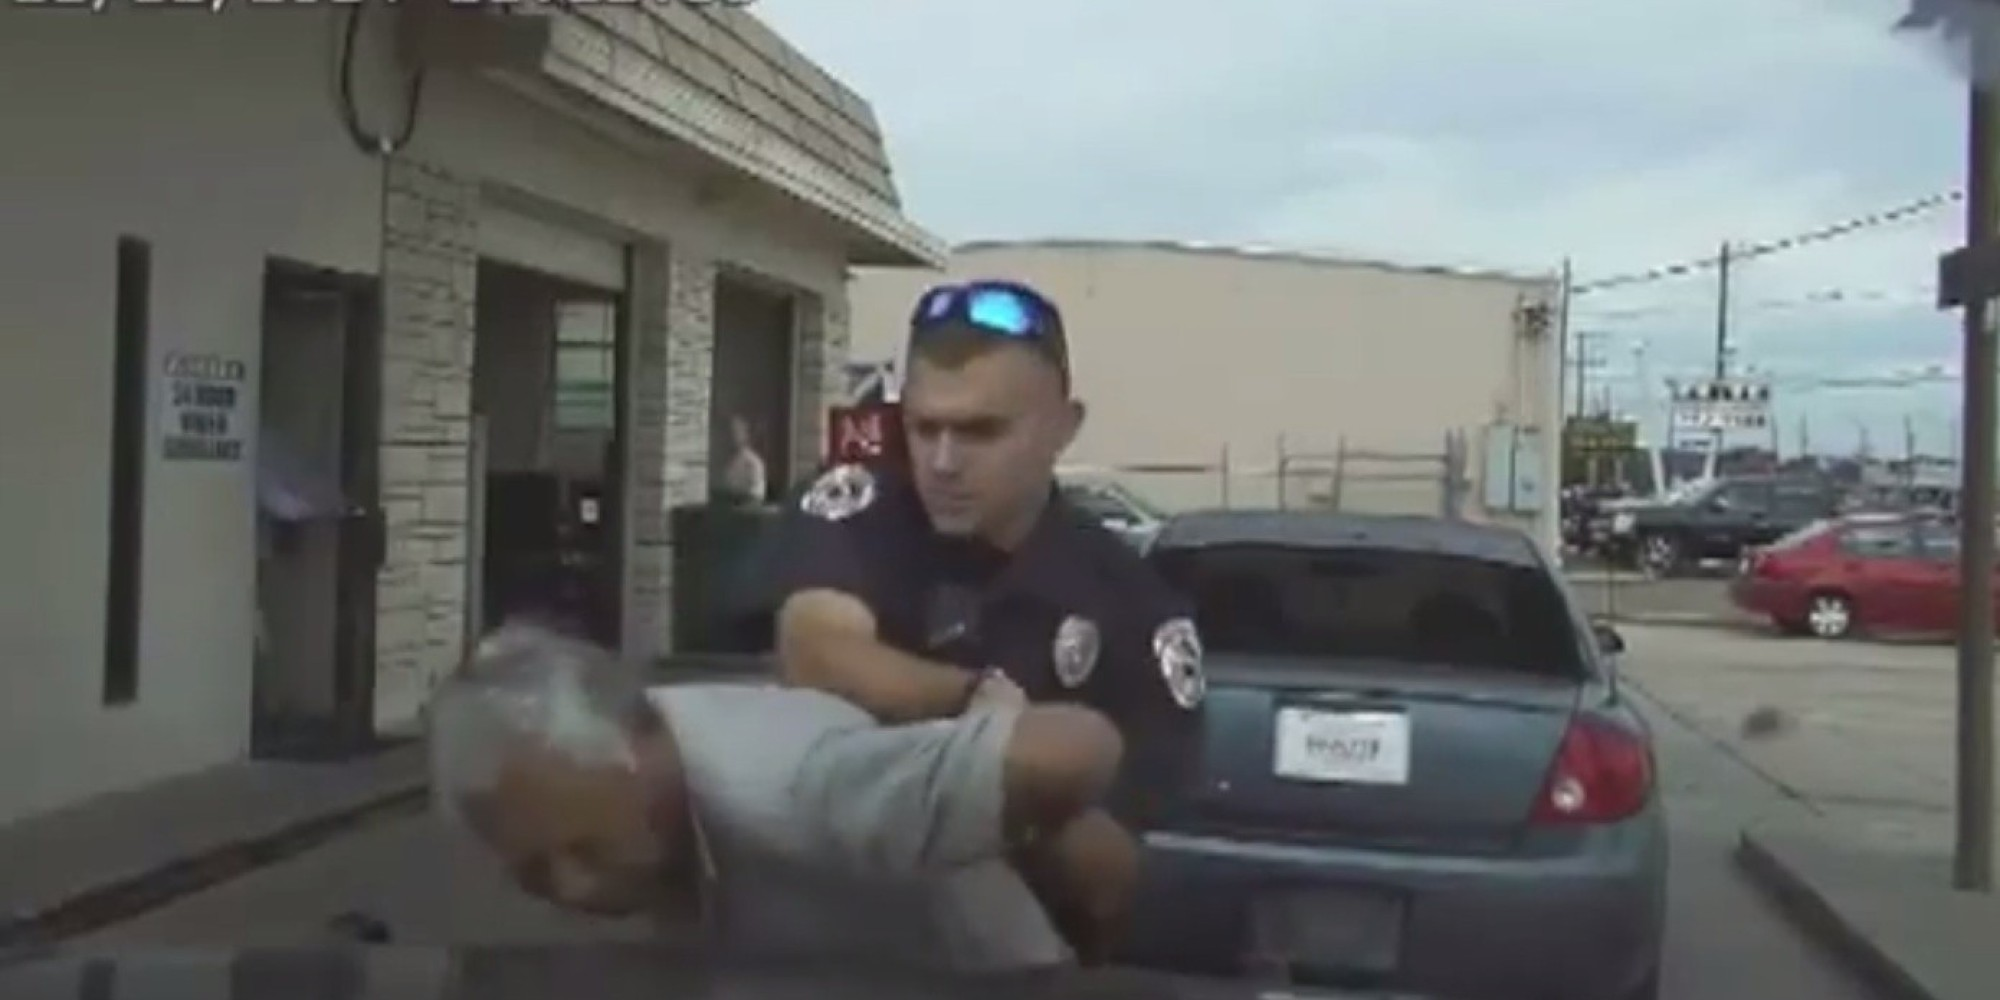 Car sticker inspection - Texas Cop Nathanial Robinson Uses Stun Gun On Elderly Man Over Inspection Sticker Huffpost